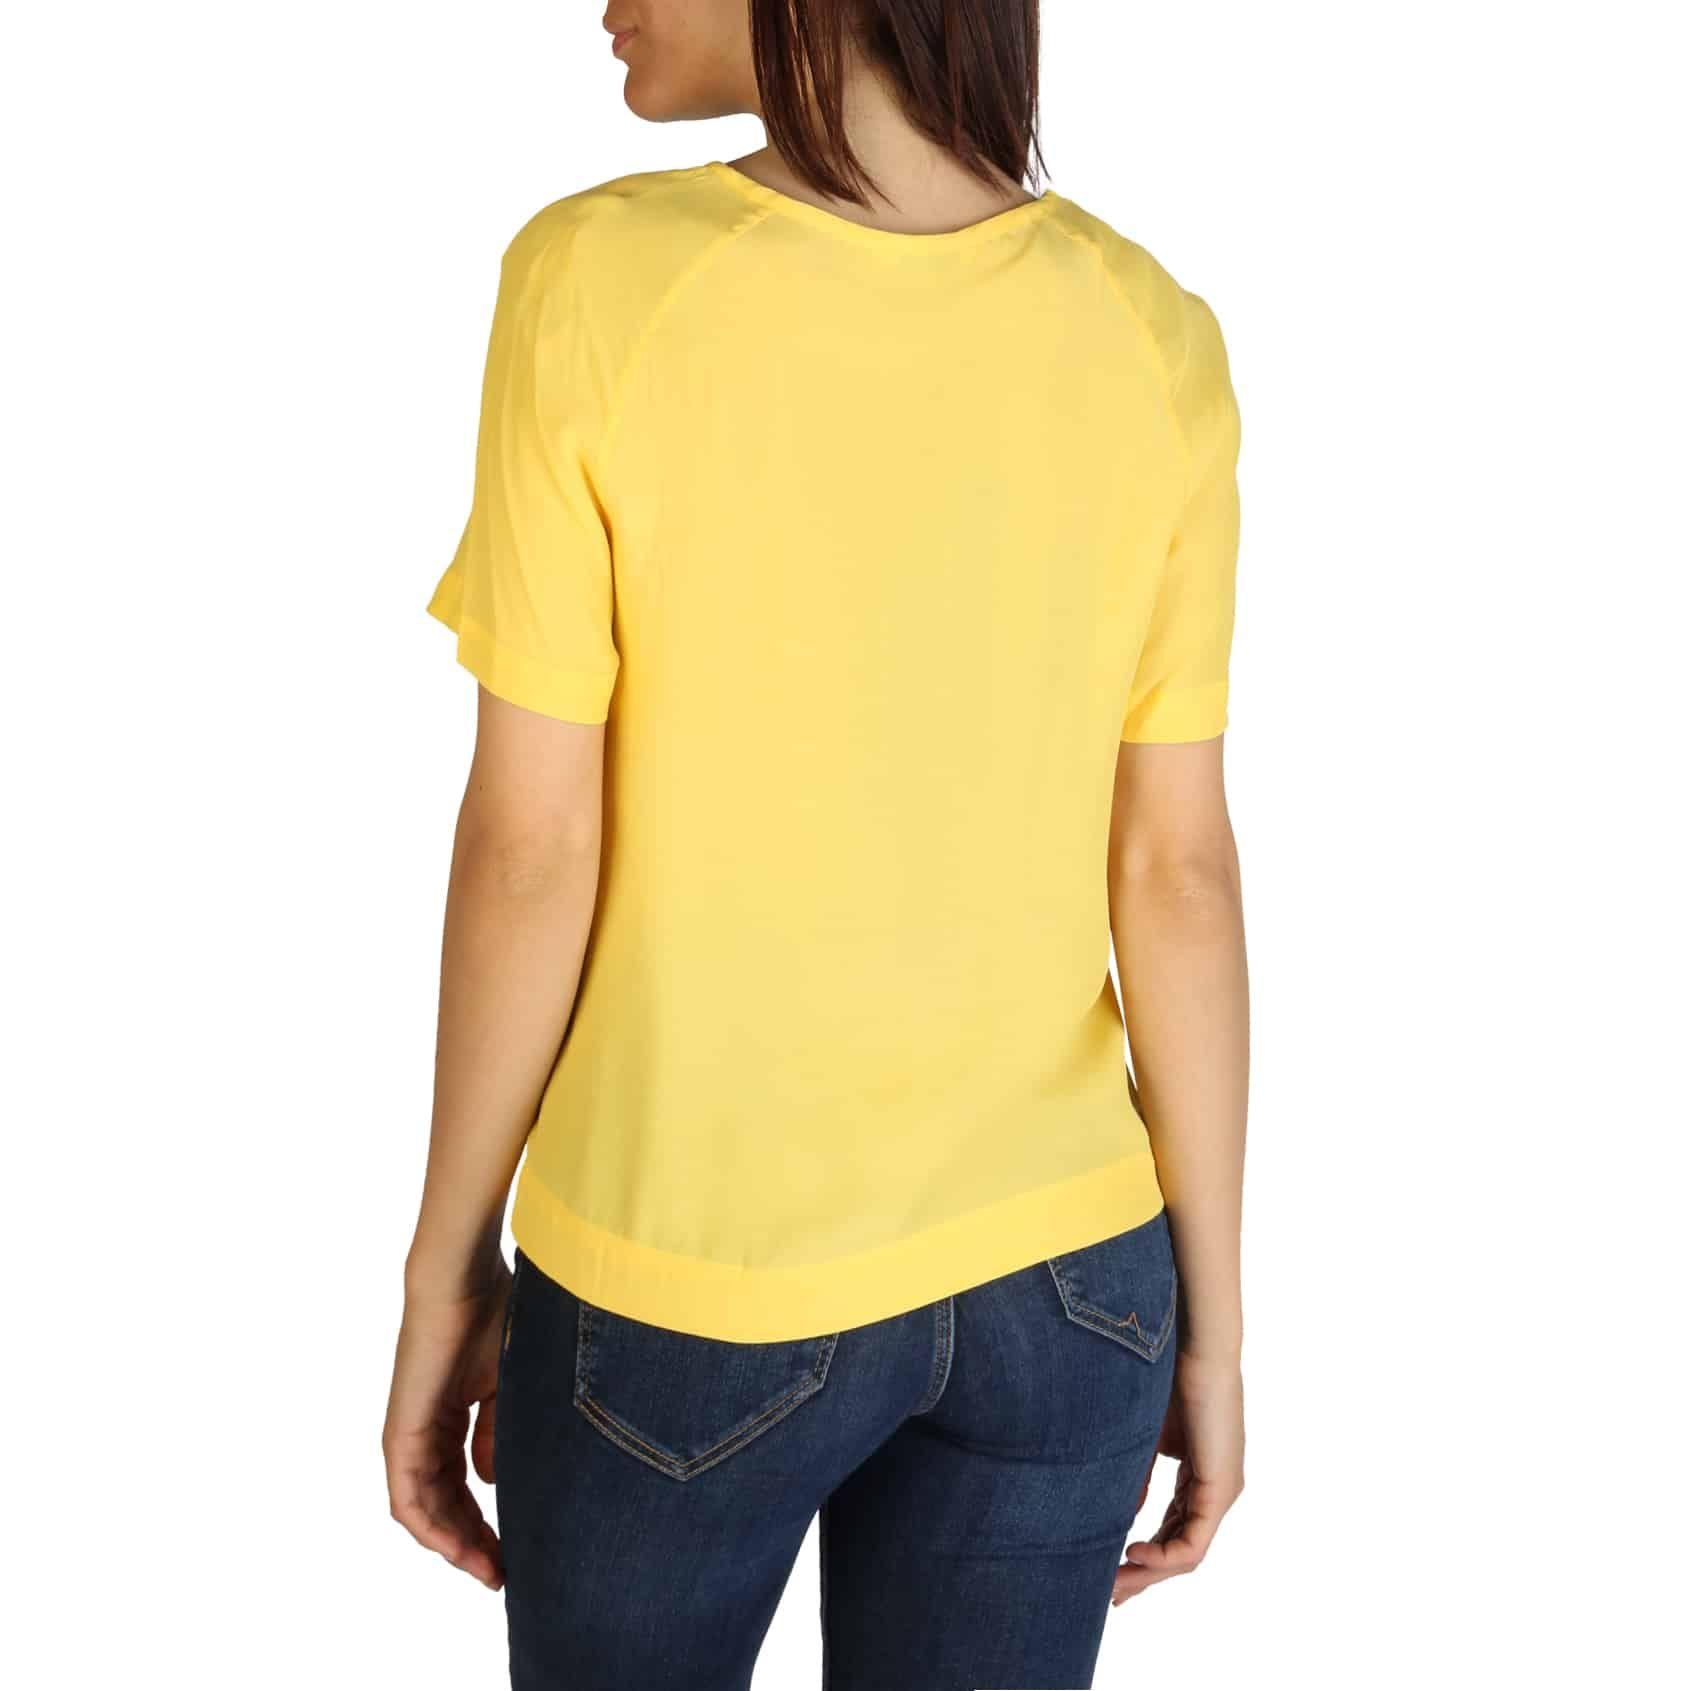 60657F20 872B 11Eb Abbe 756064413543 Tommy Hilfiger - Xw0Xw01059 - Yellow